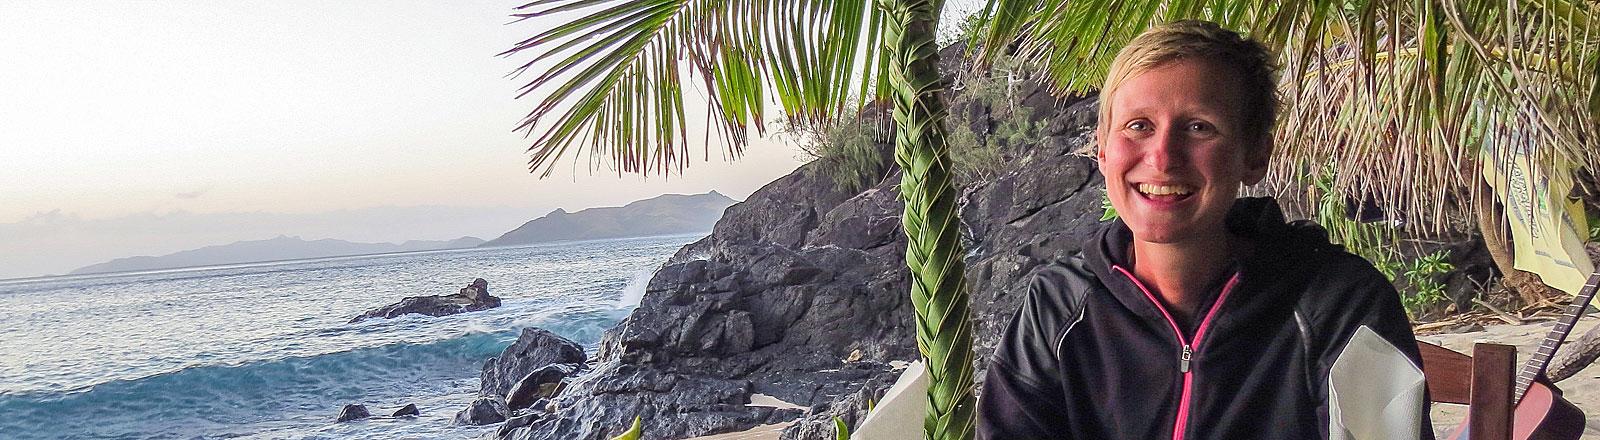 Carolin Steig auf Fidji